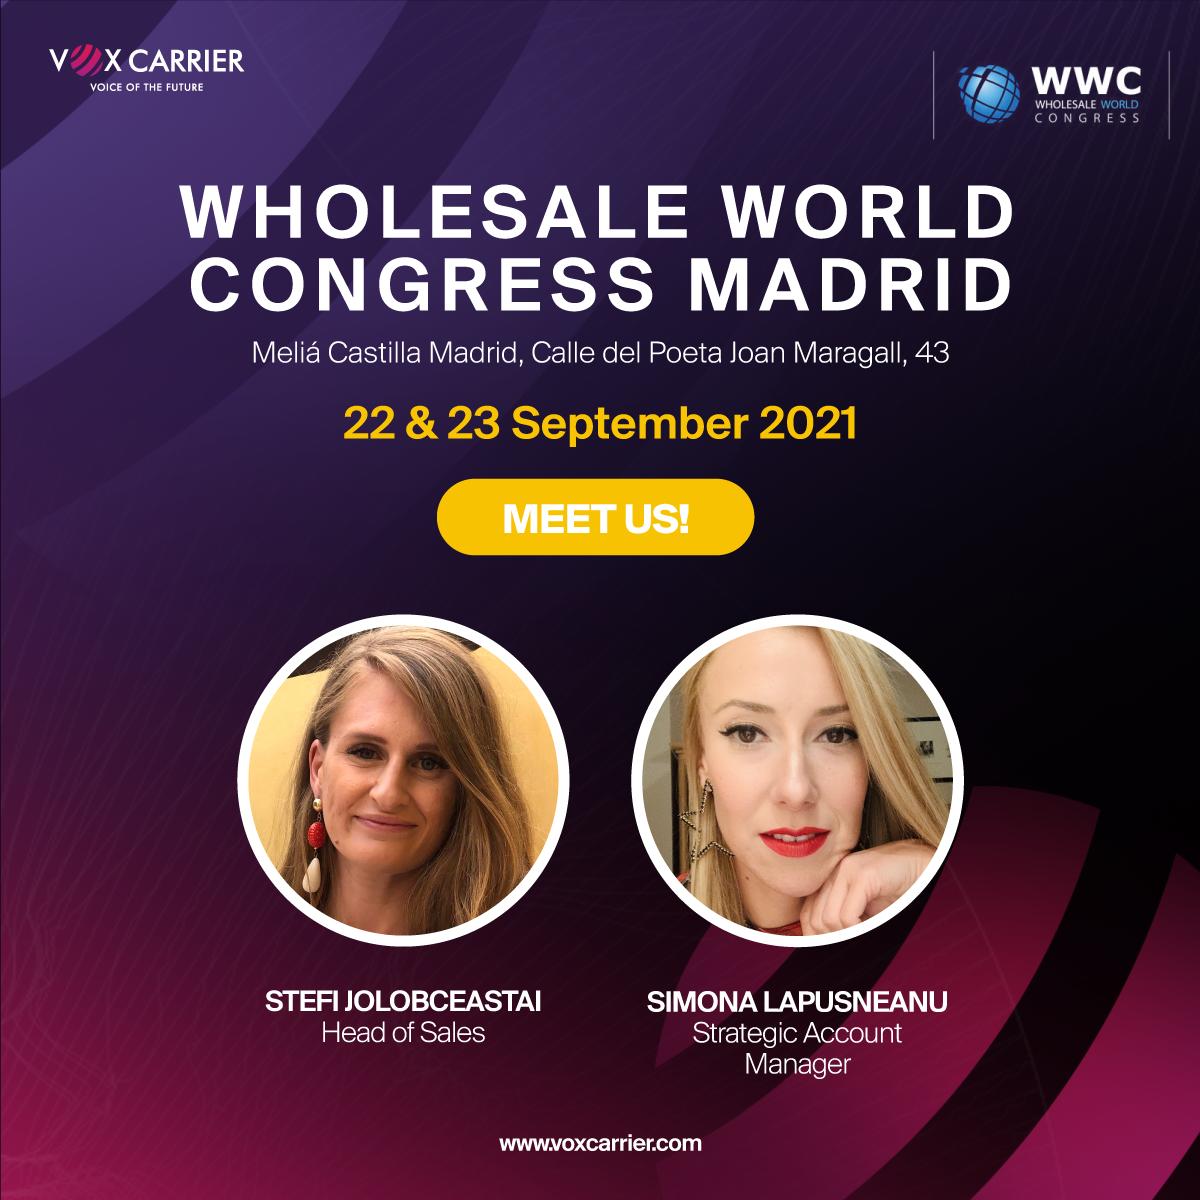 WWC Madrid